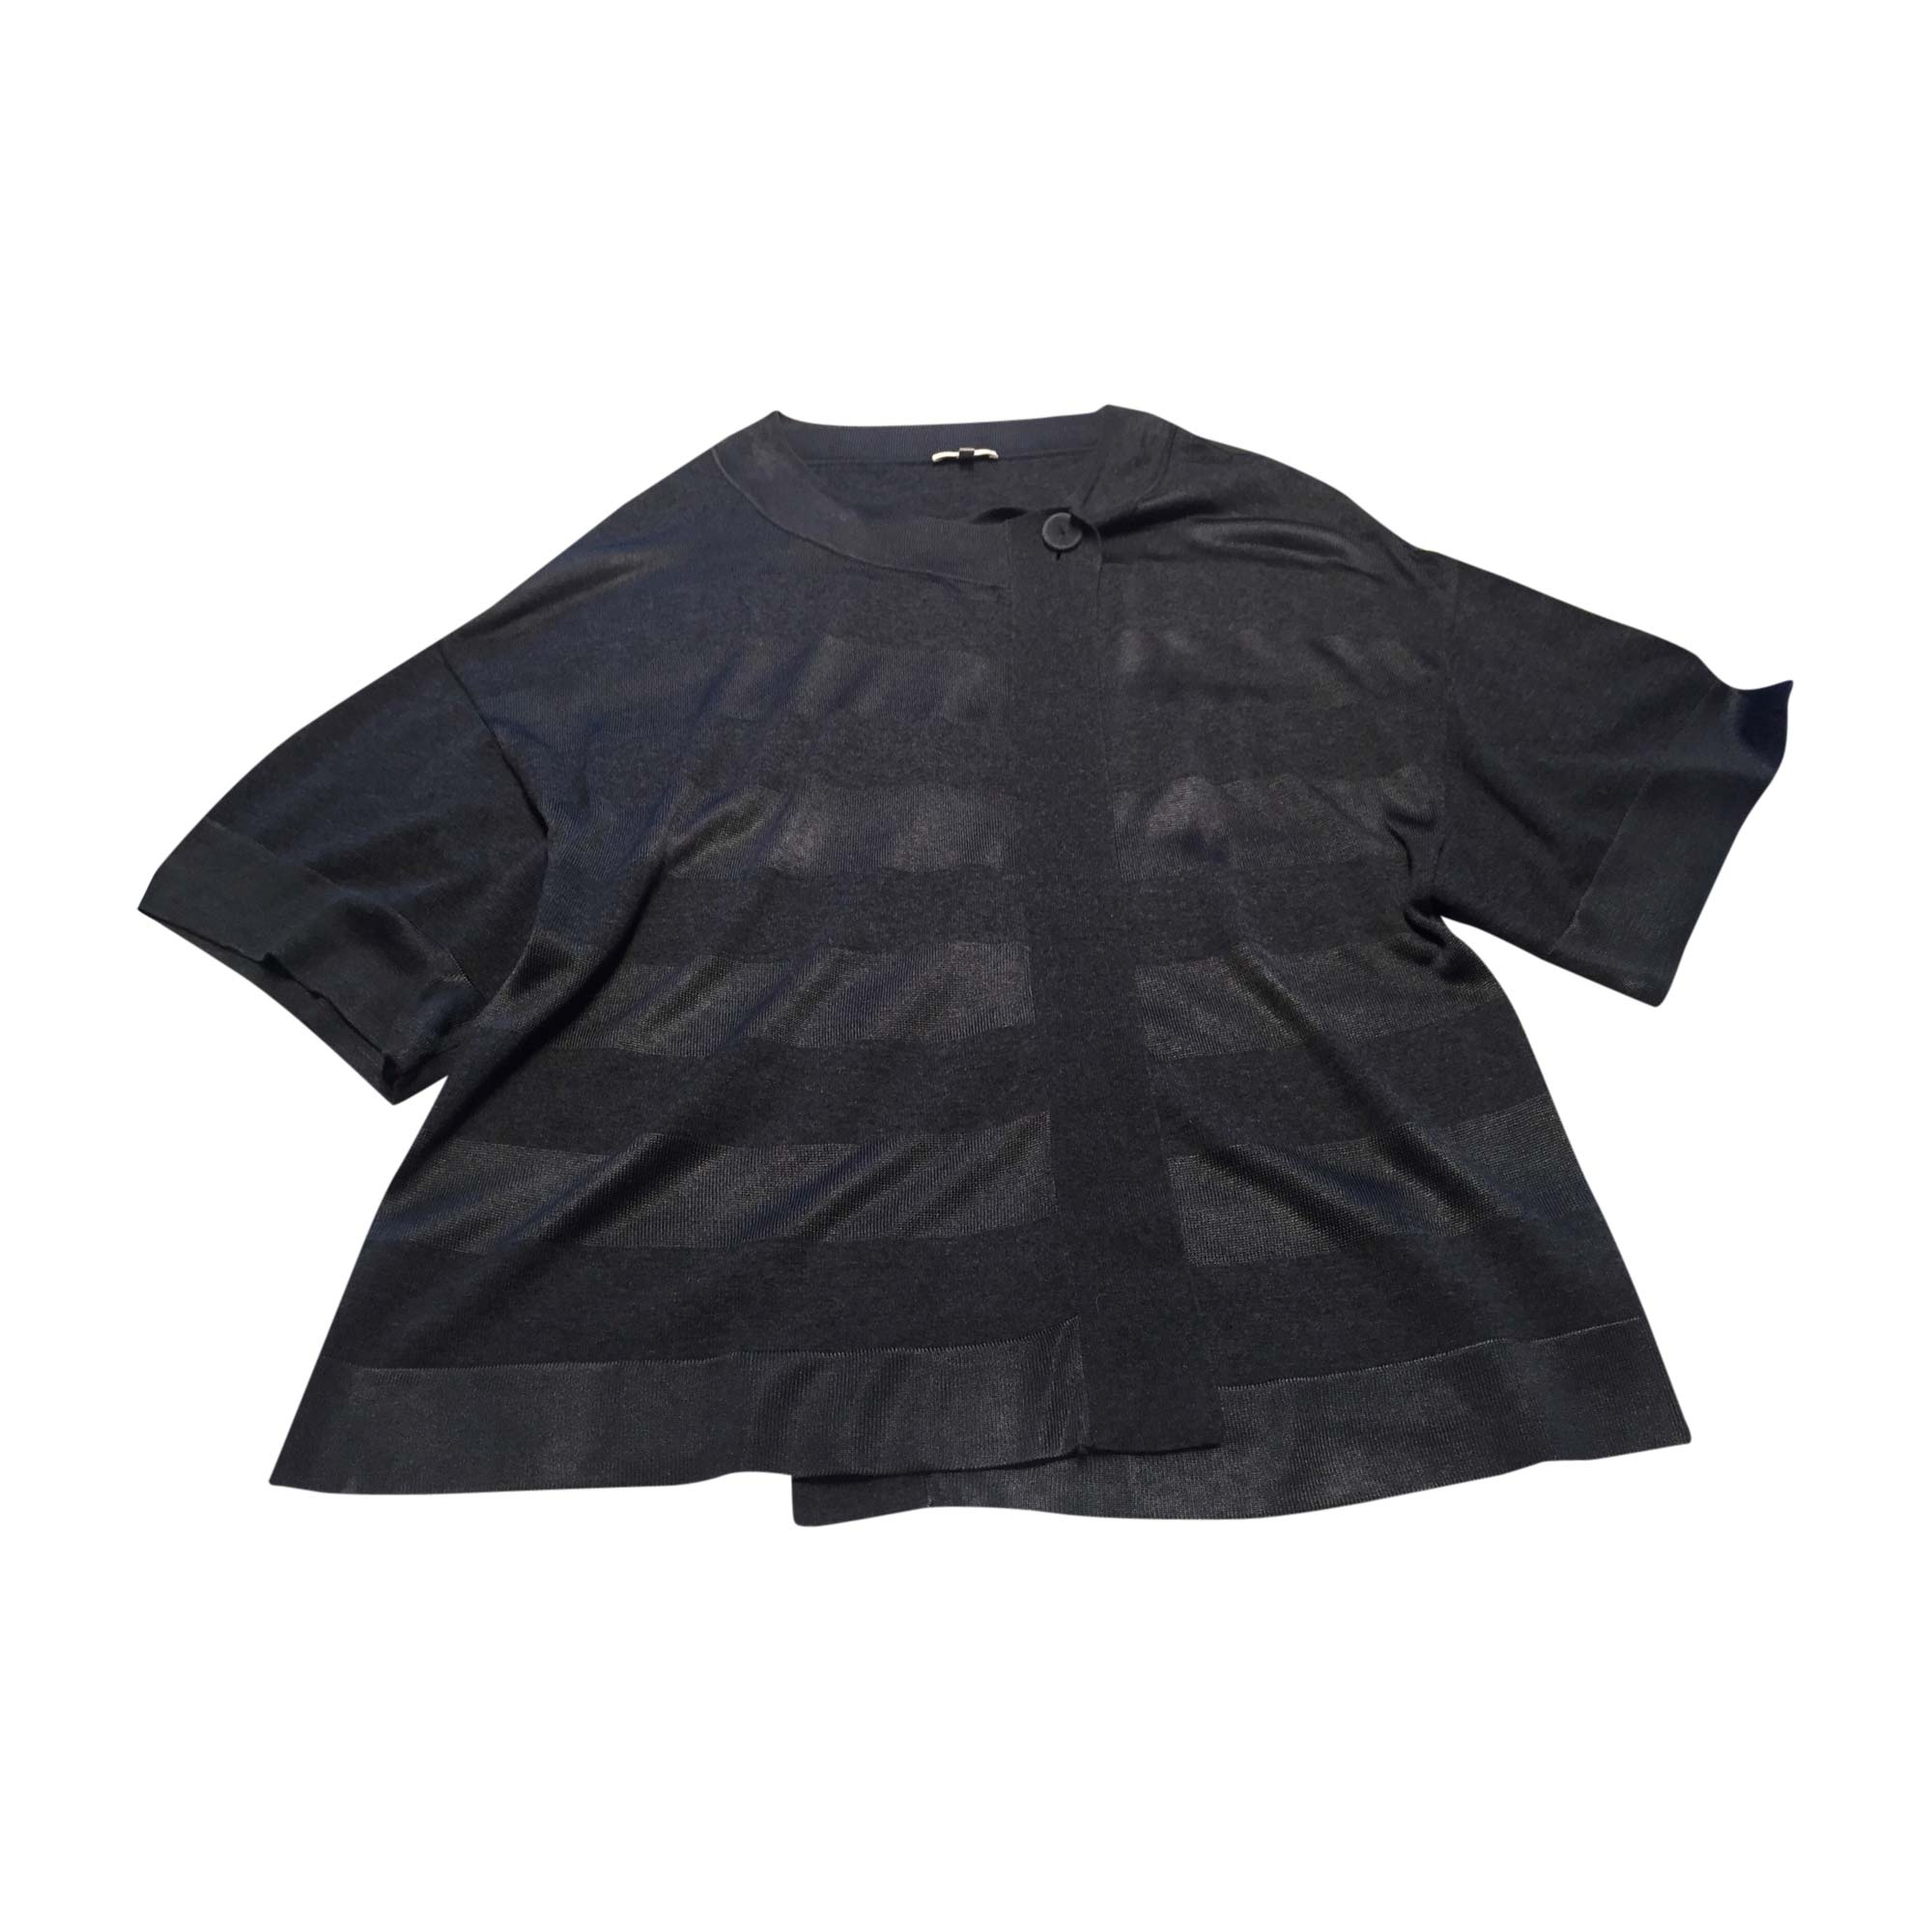 Vest, Cardigan KENZO Black